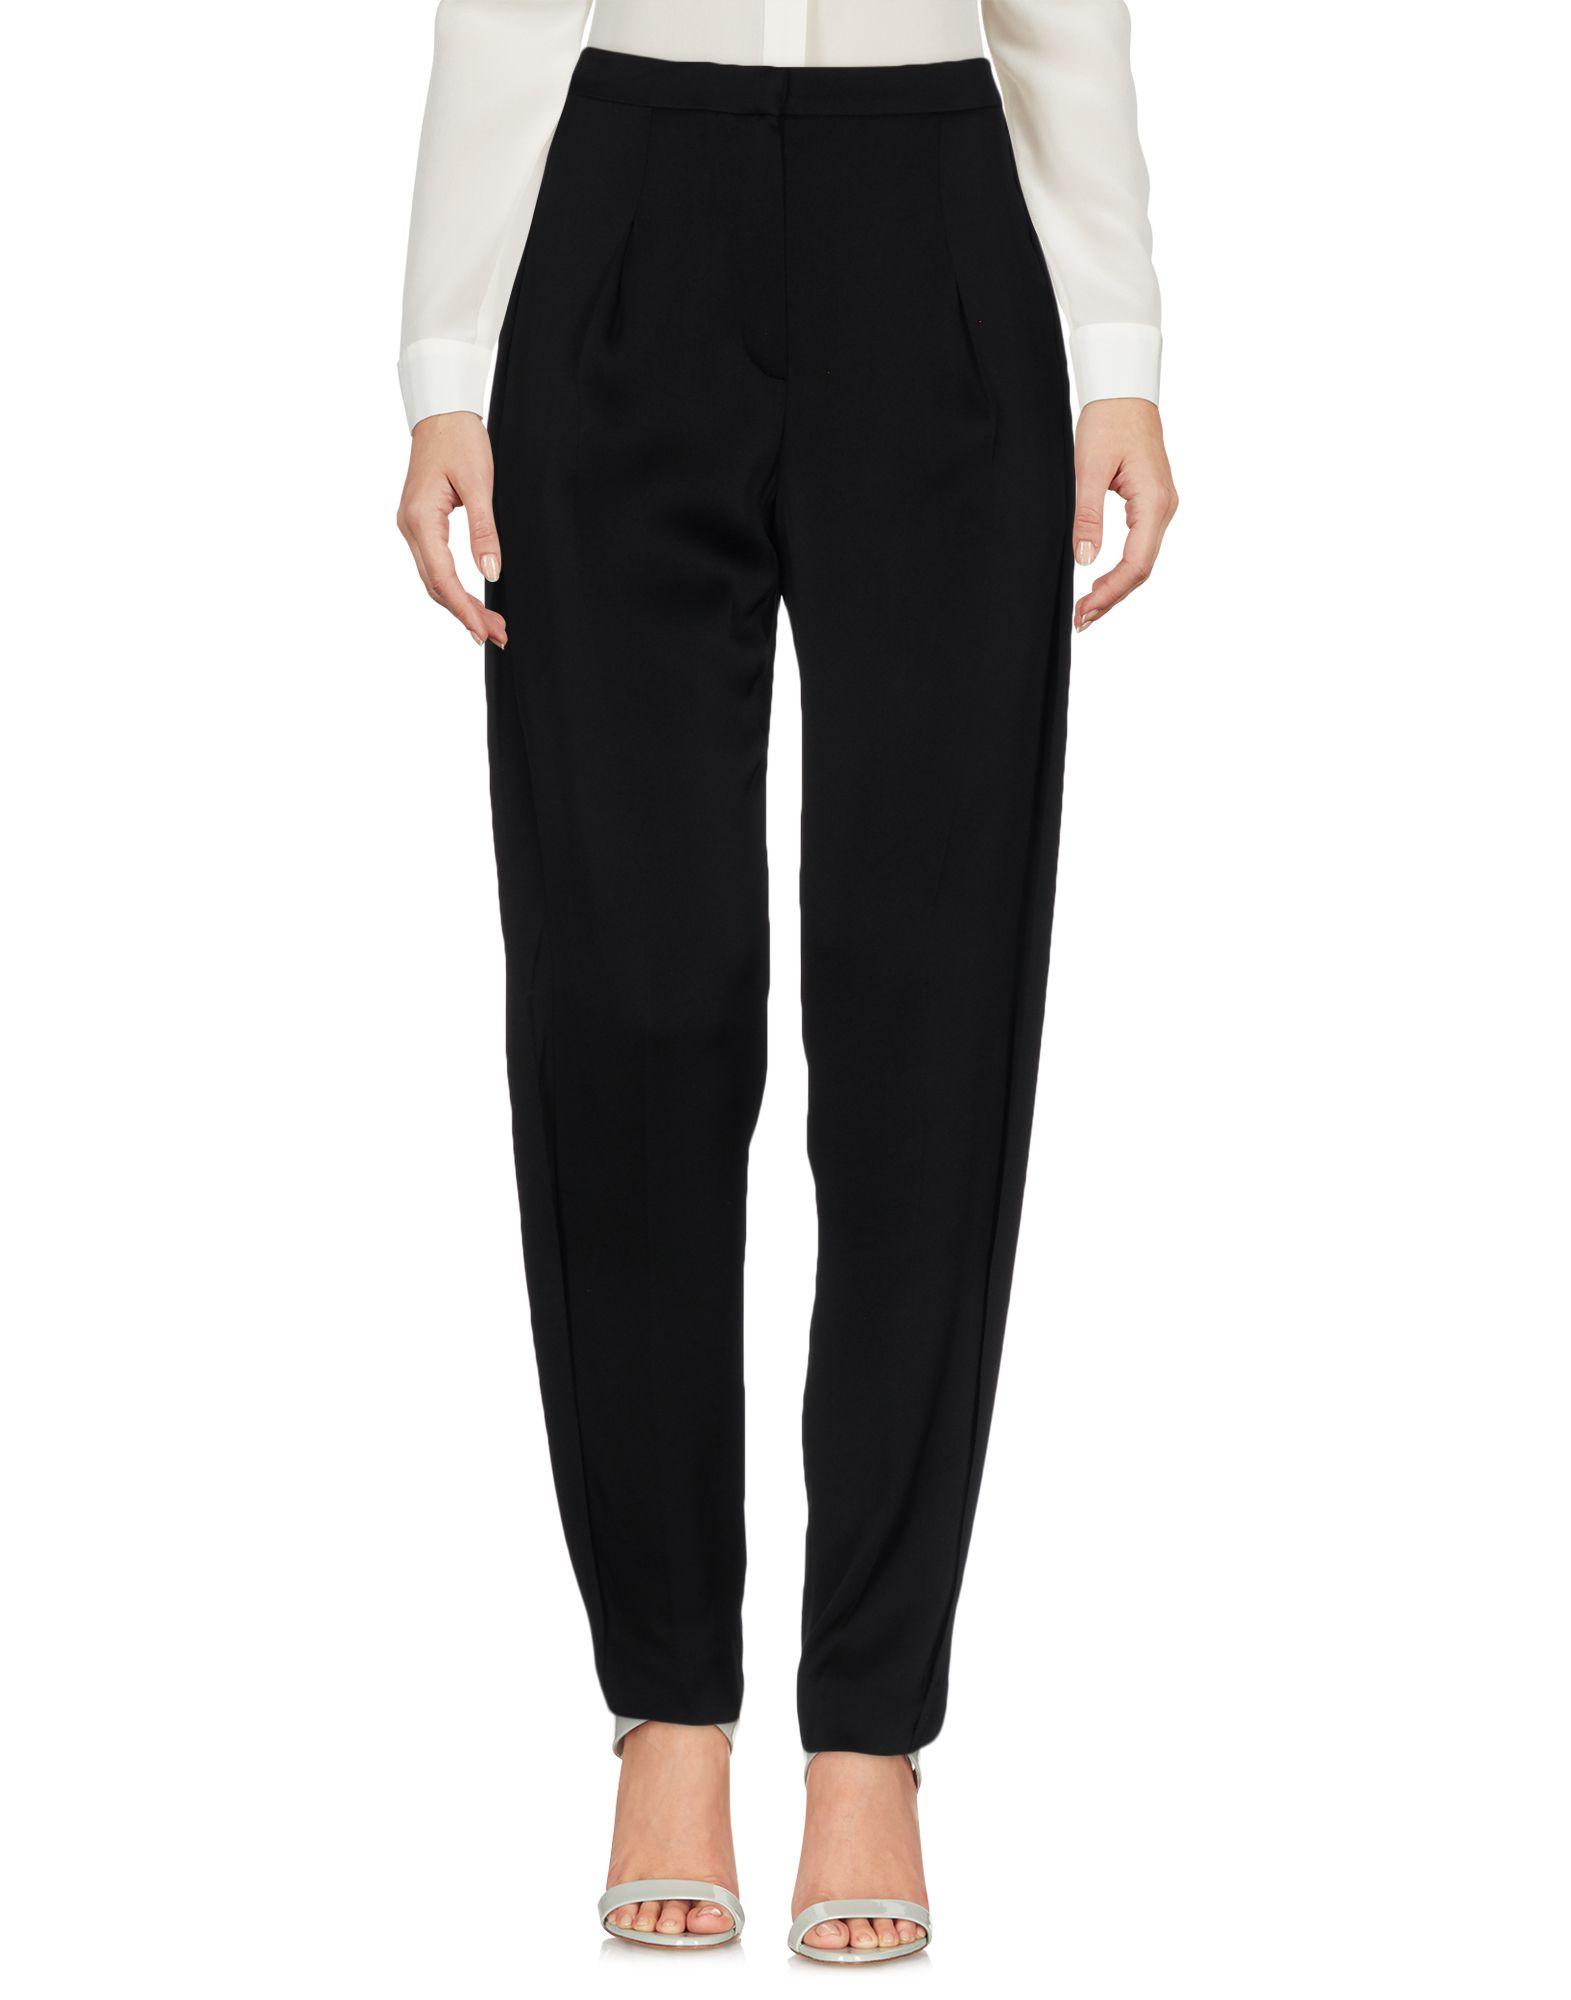 Pantalone Lanvin Donna - Acquista online su wQvGhJfmc